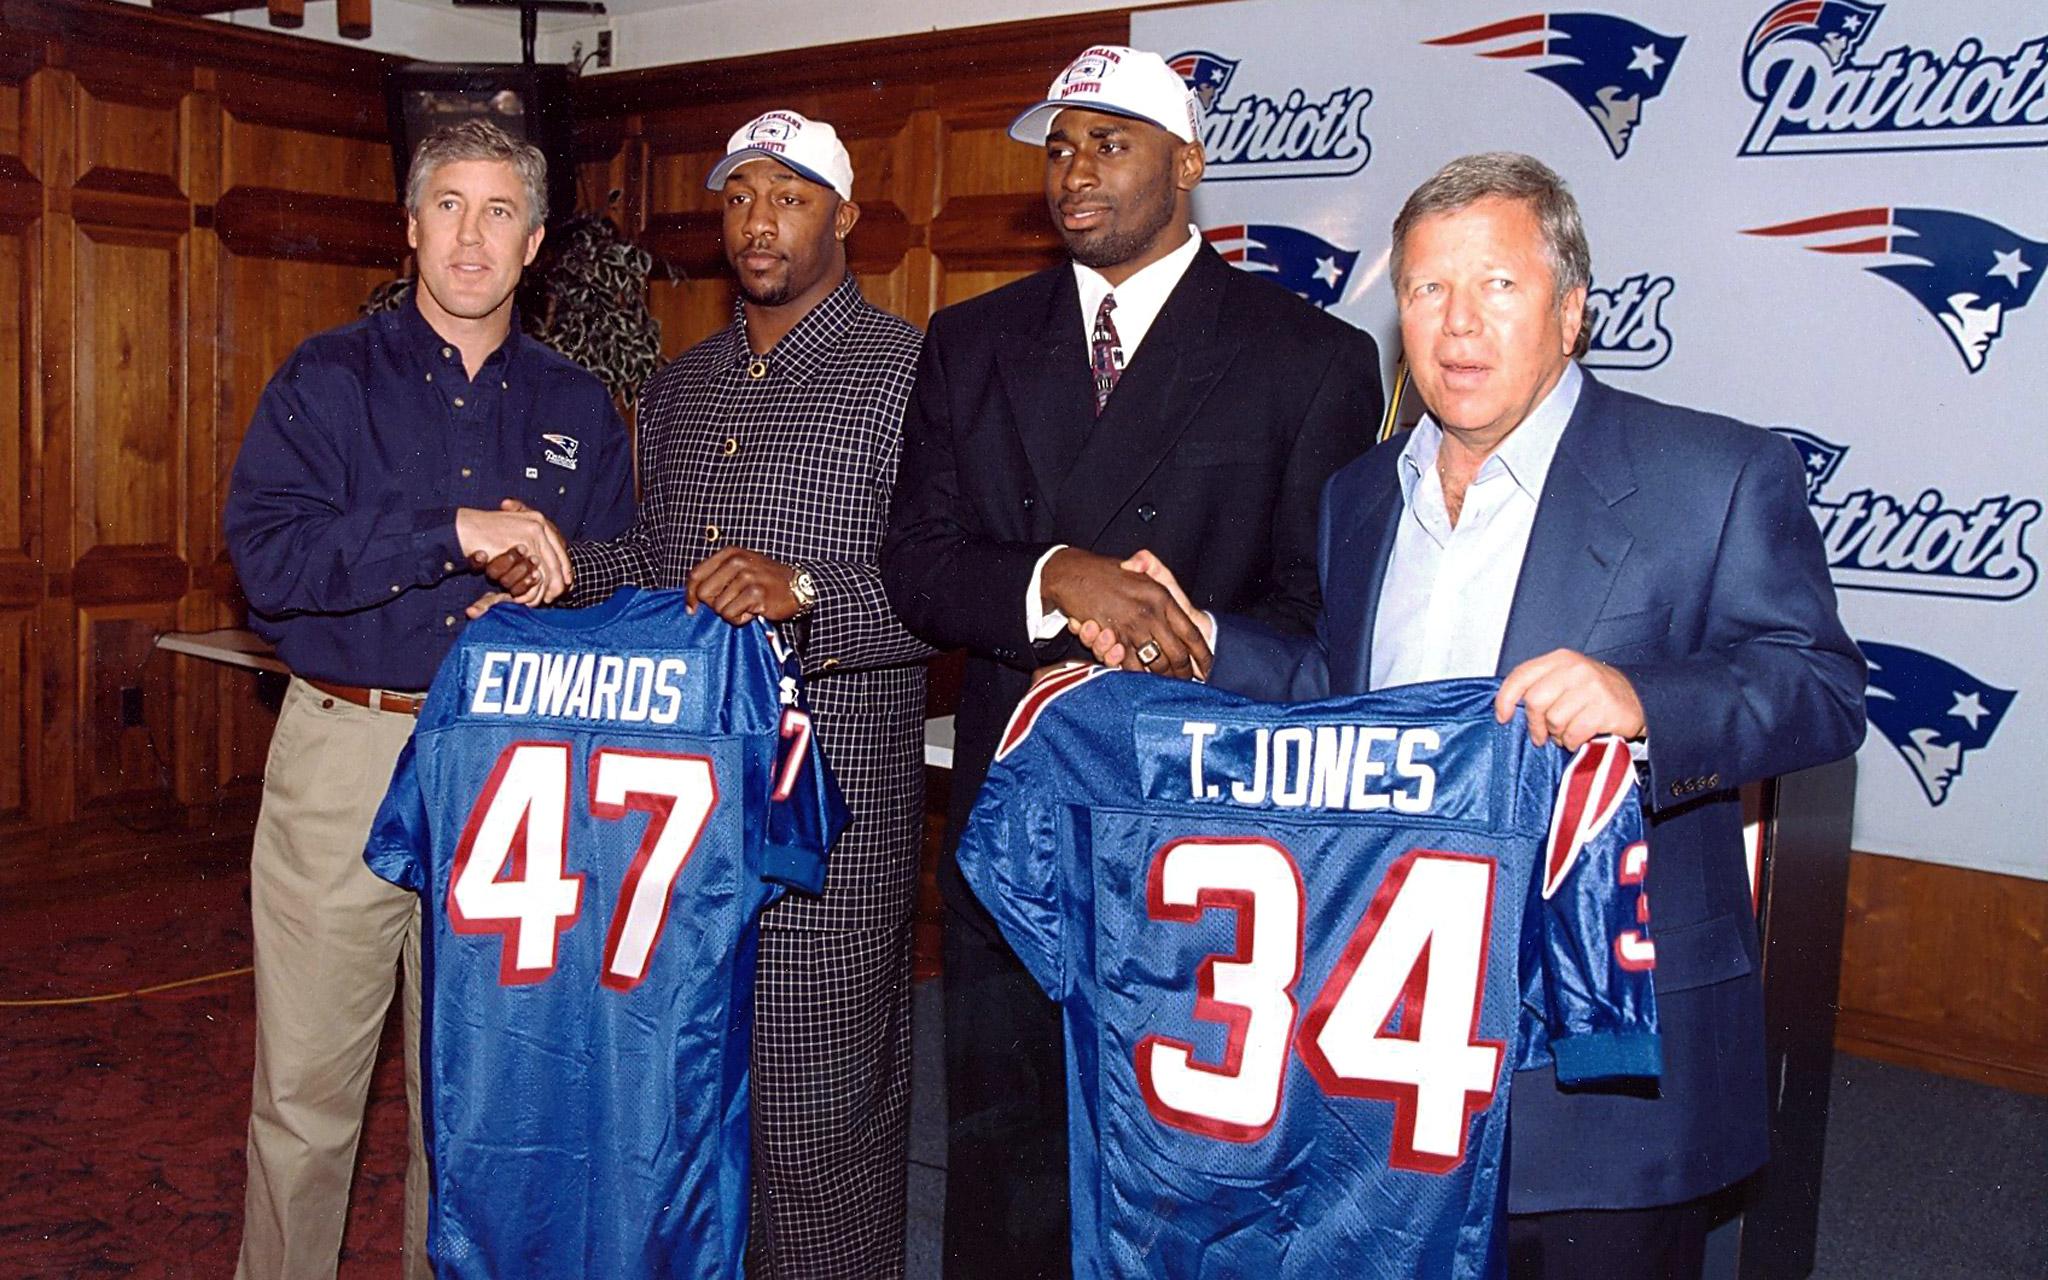 1998: Edwards & Jones -- promise cut short